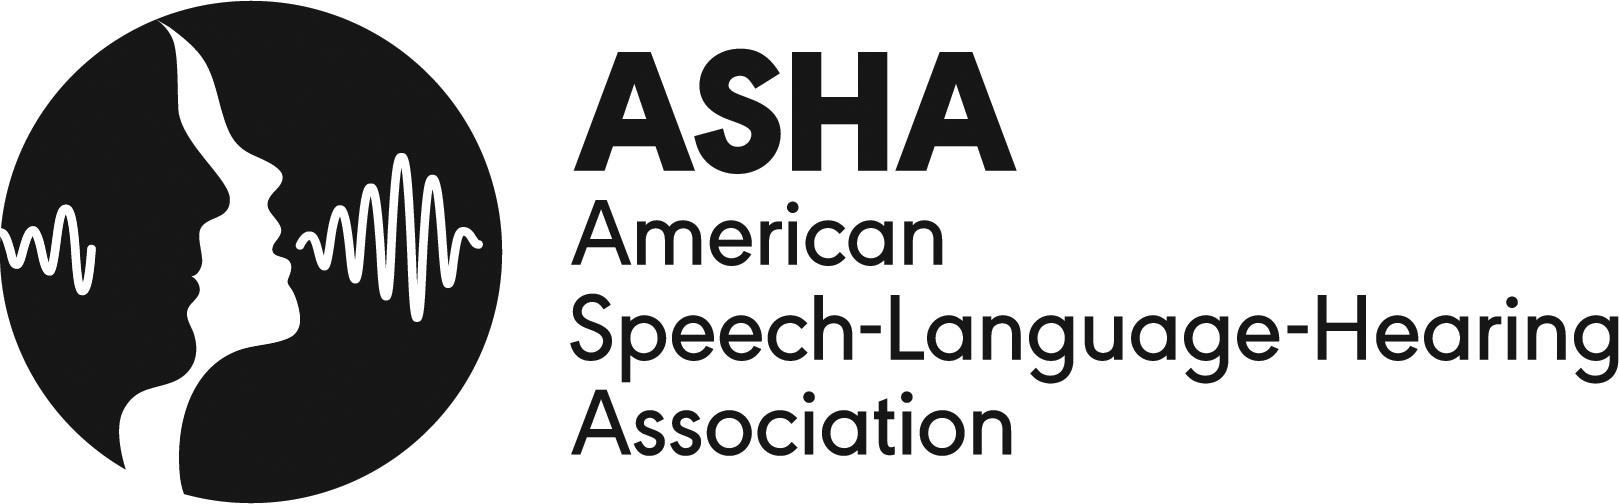 American Speech-Language-Hearing Association logo